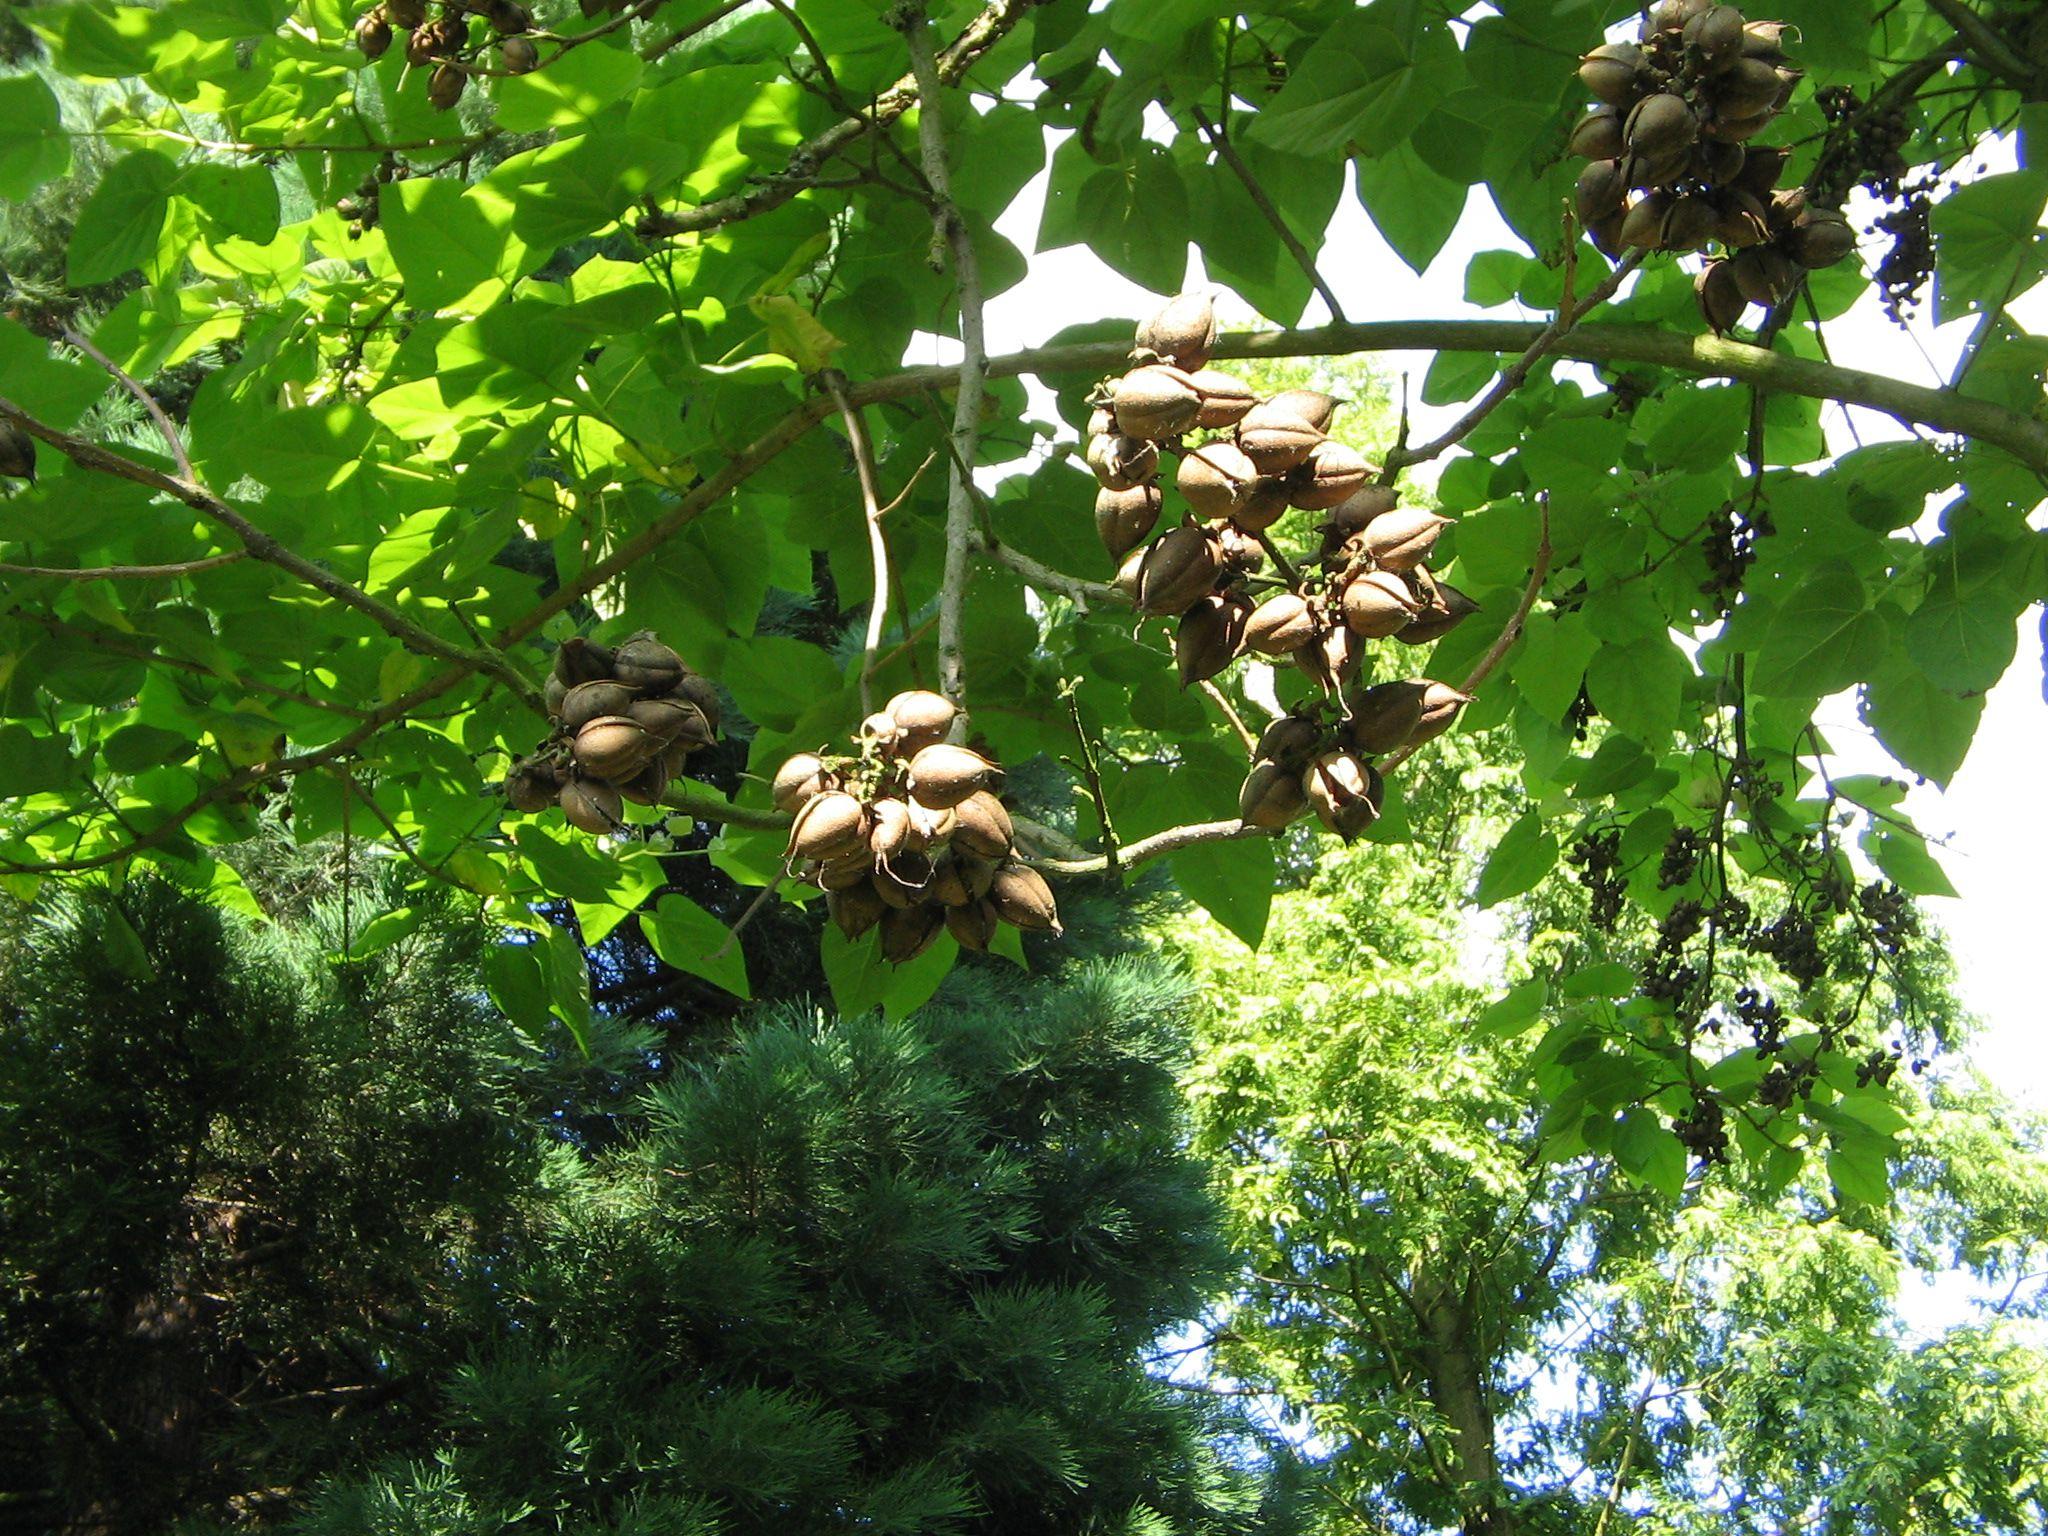 Common North American Hardwood Trees